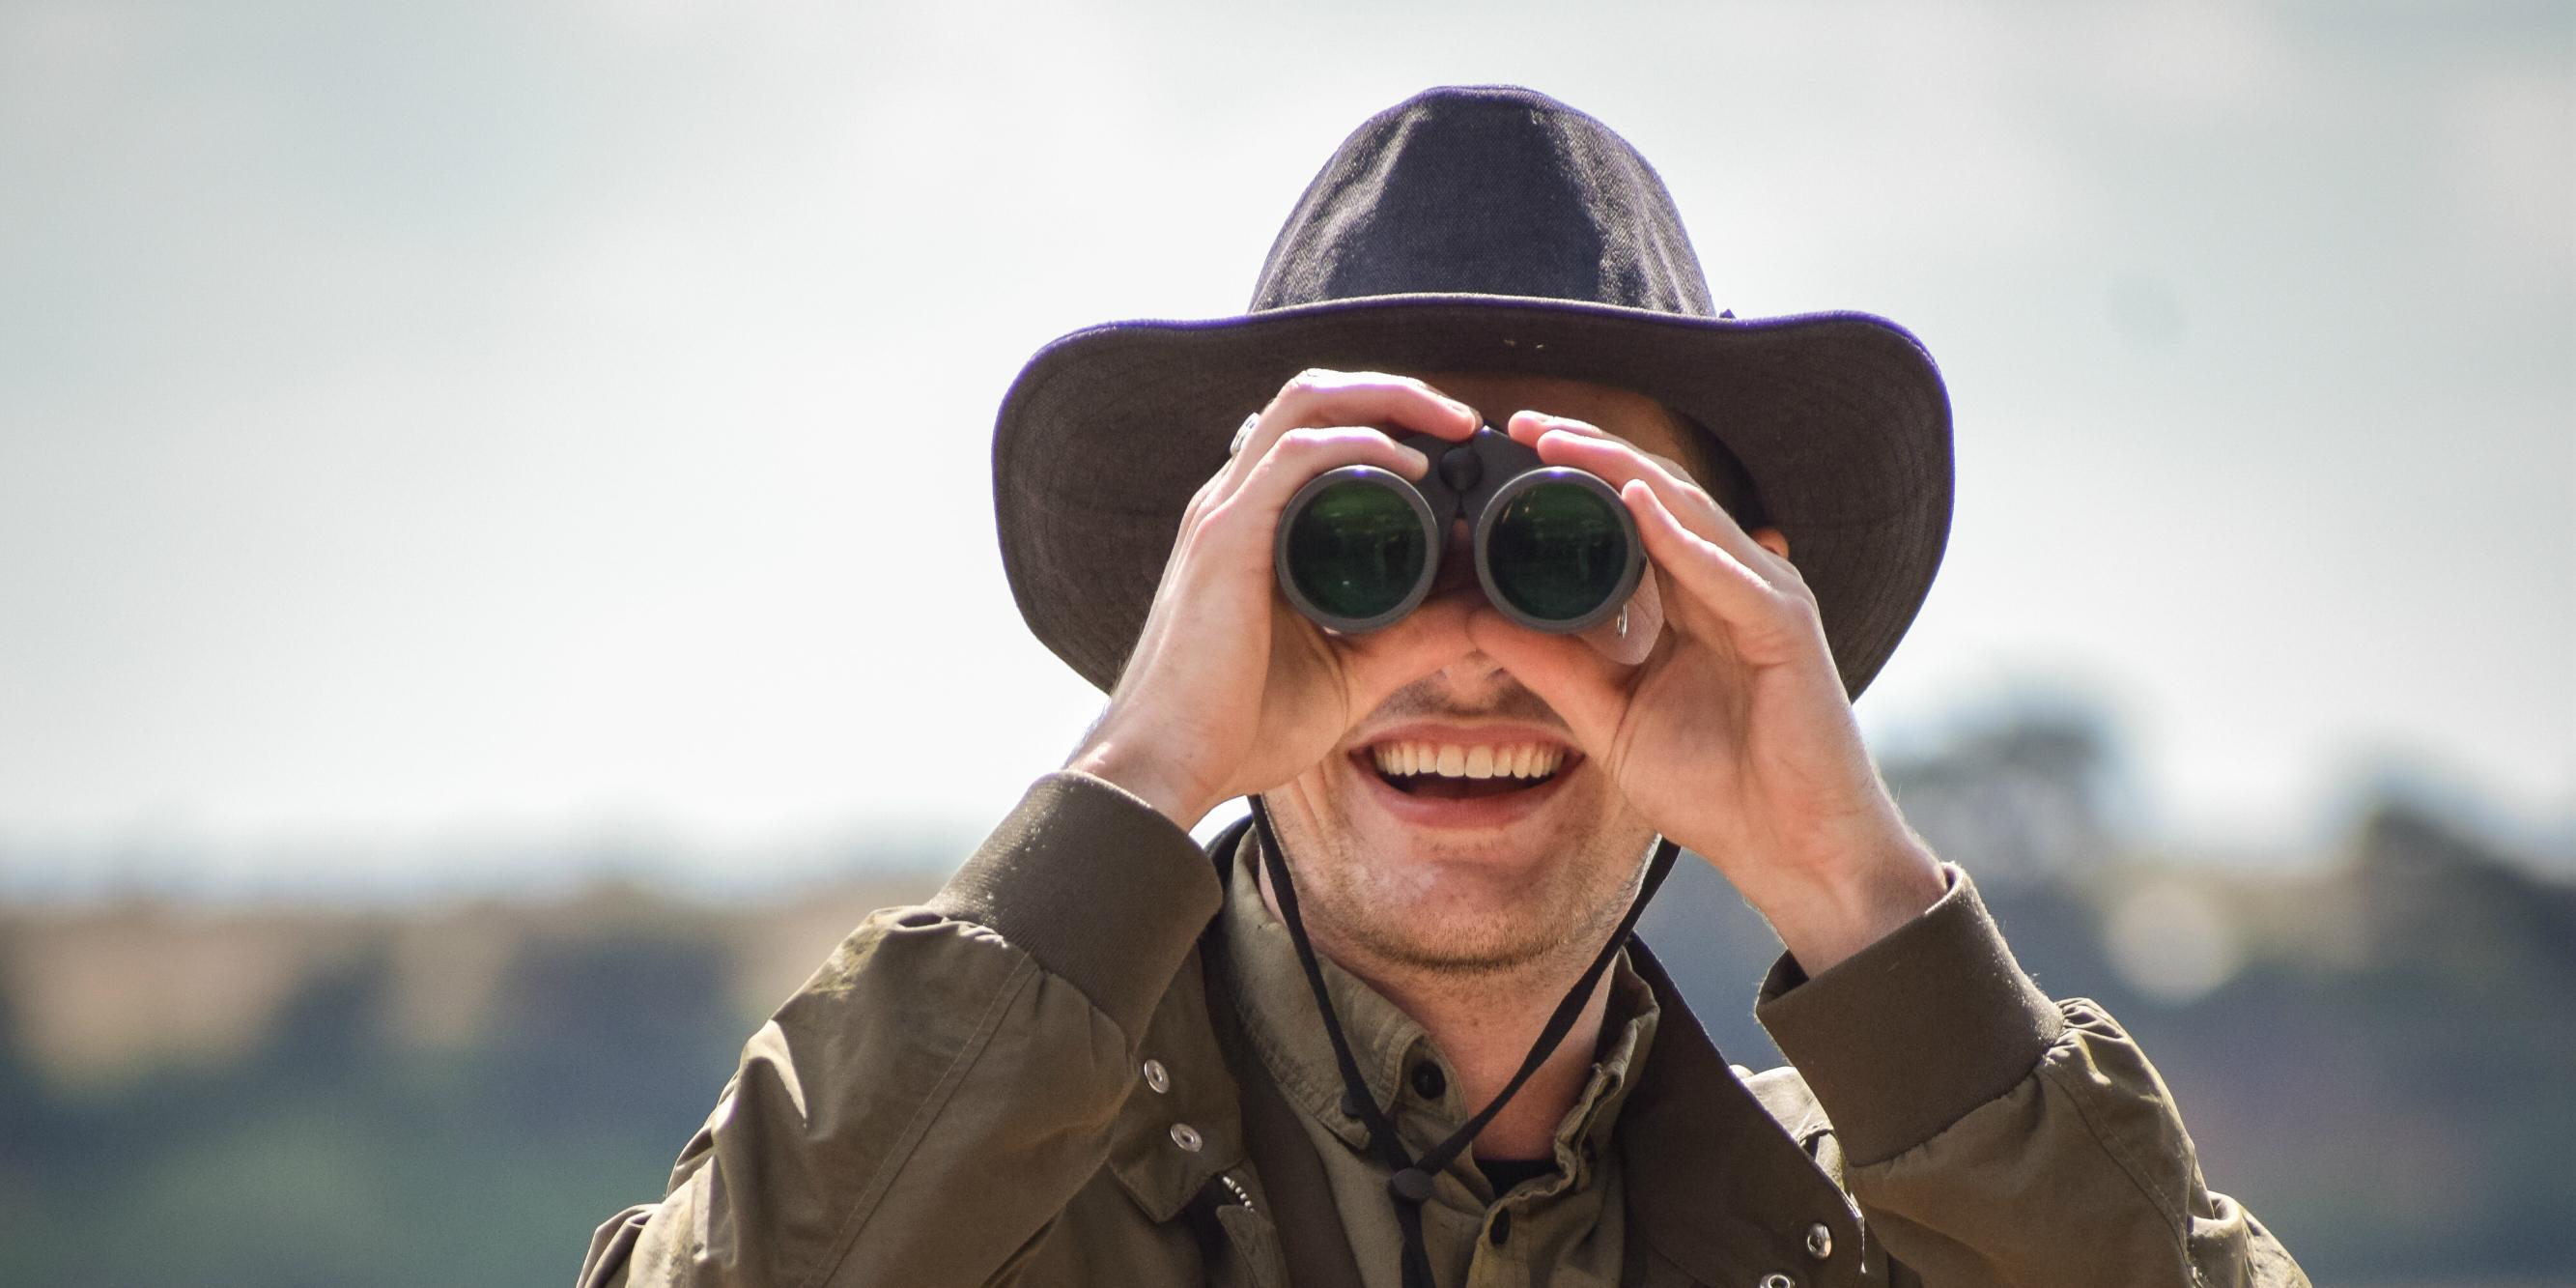 A wildlifer conservation participant looks through binoculars.